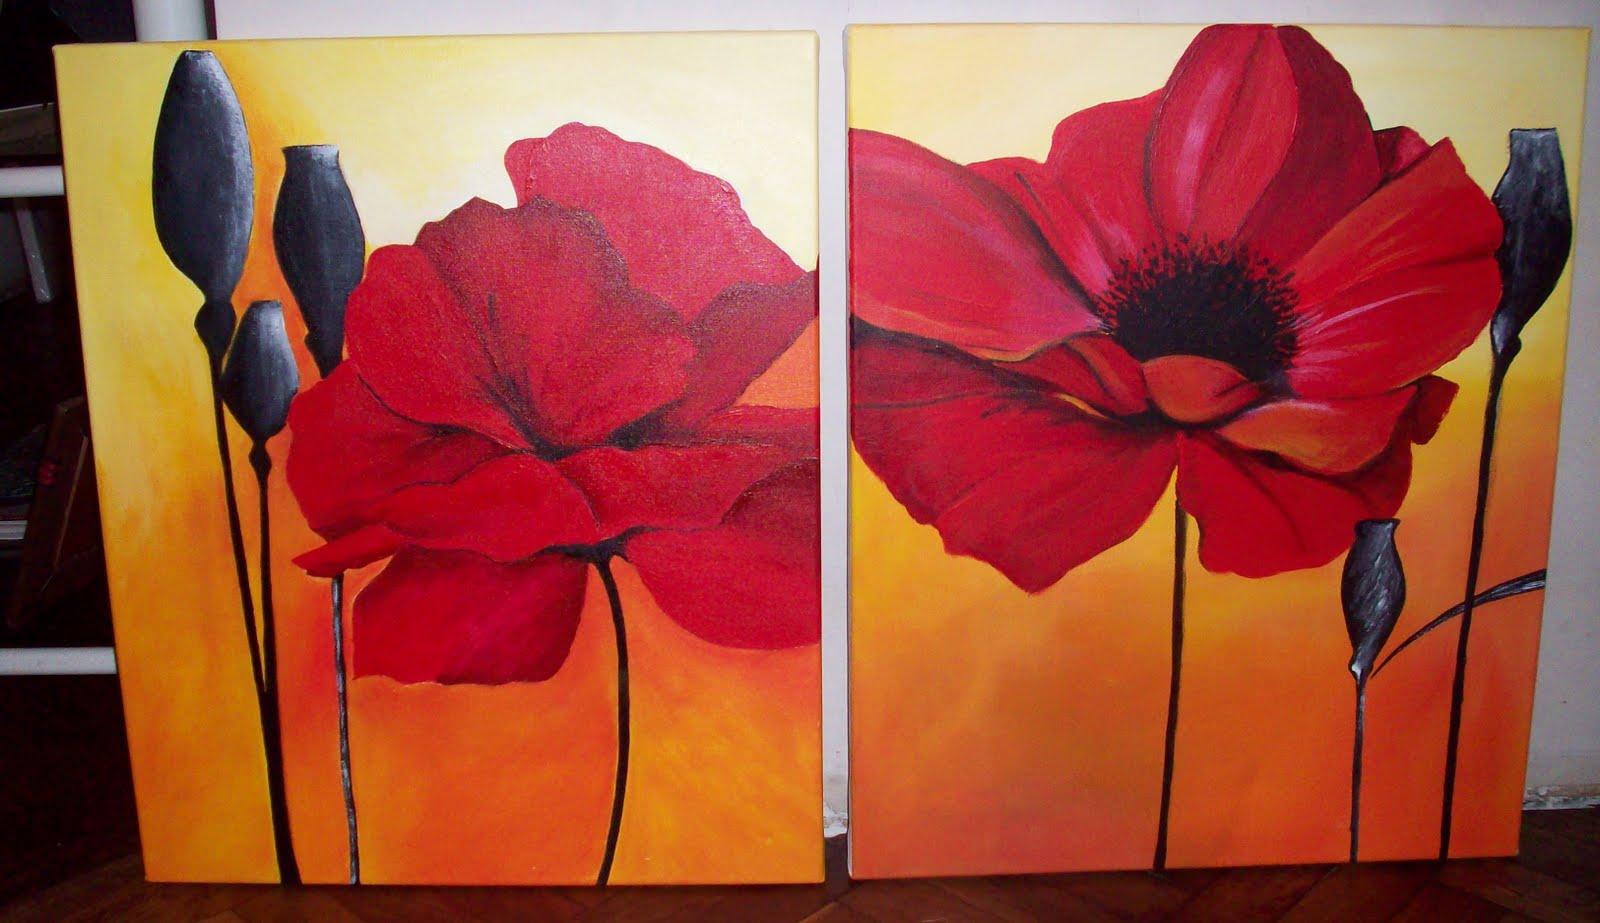 Cuadros flores modernos polipticos tripticos decorativos - Cuadros decorativos modernos ...